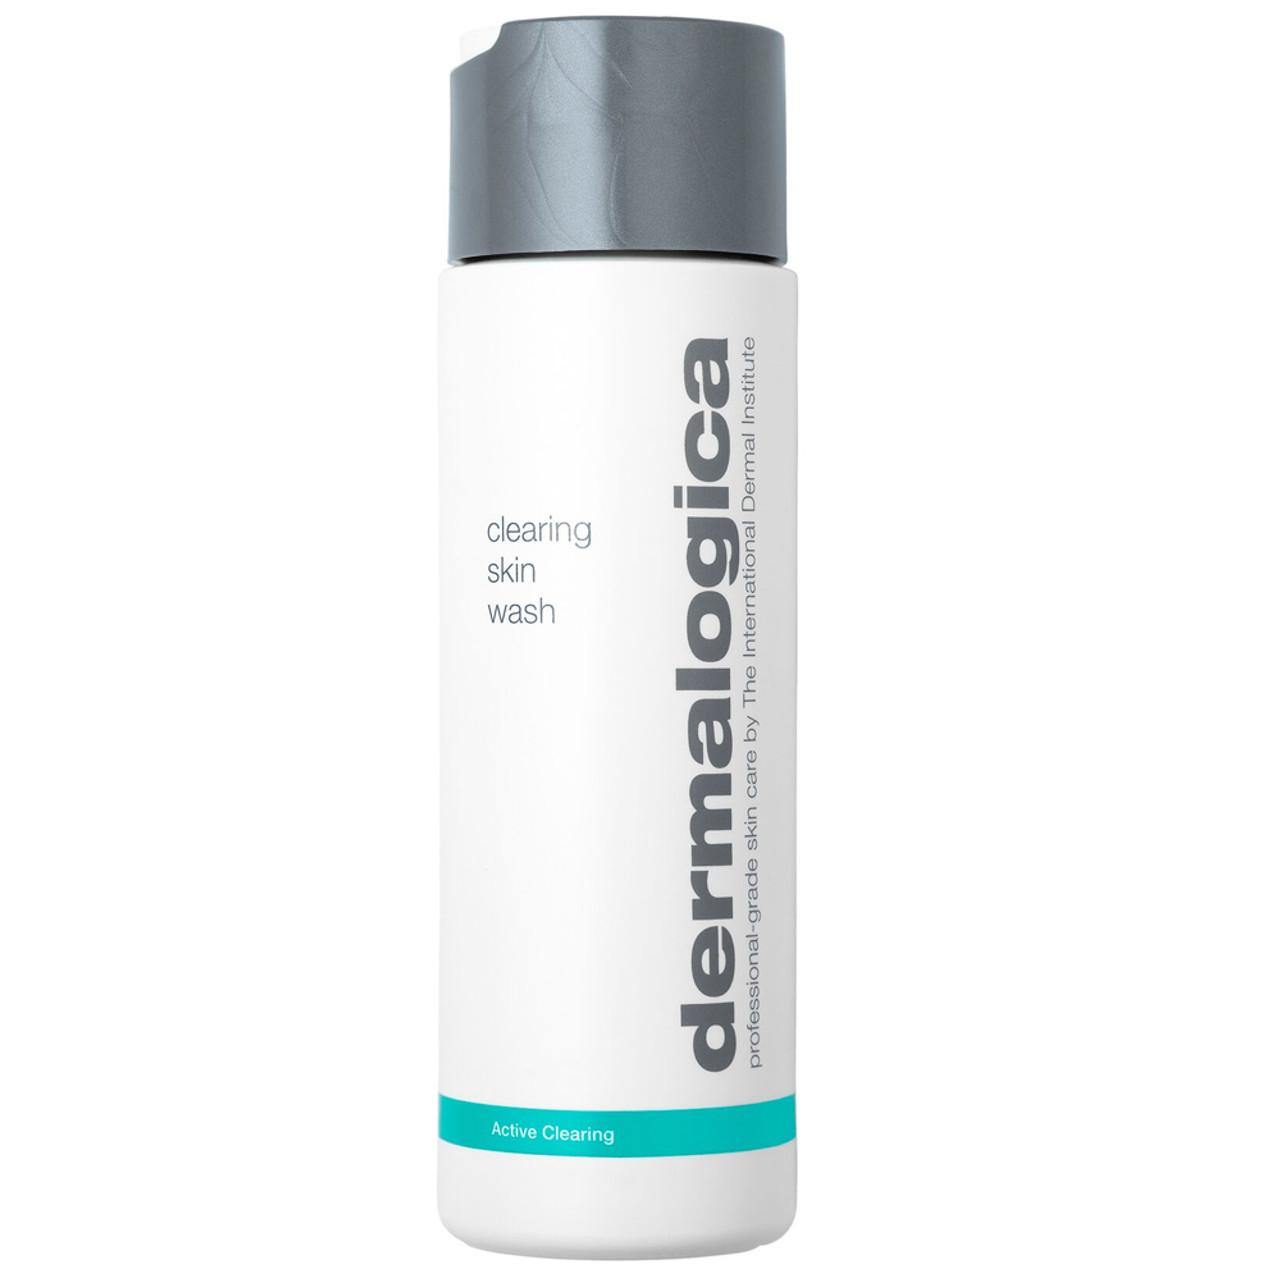 Dermalogica Active Clearing Skin Wash 8.4 oz